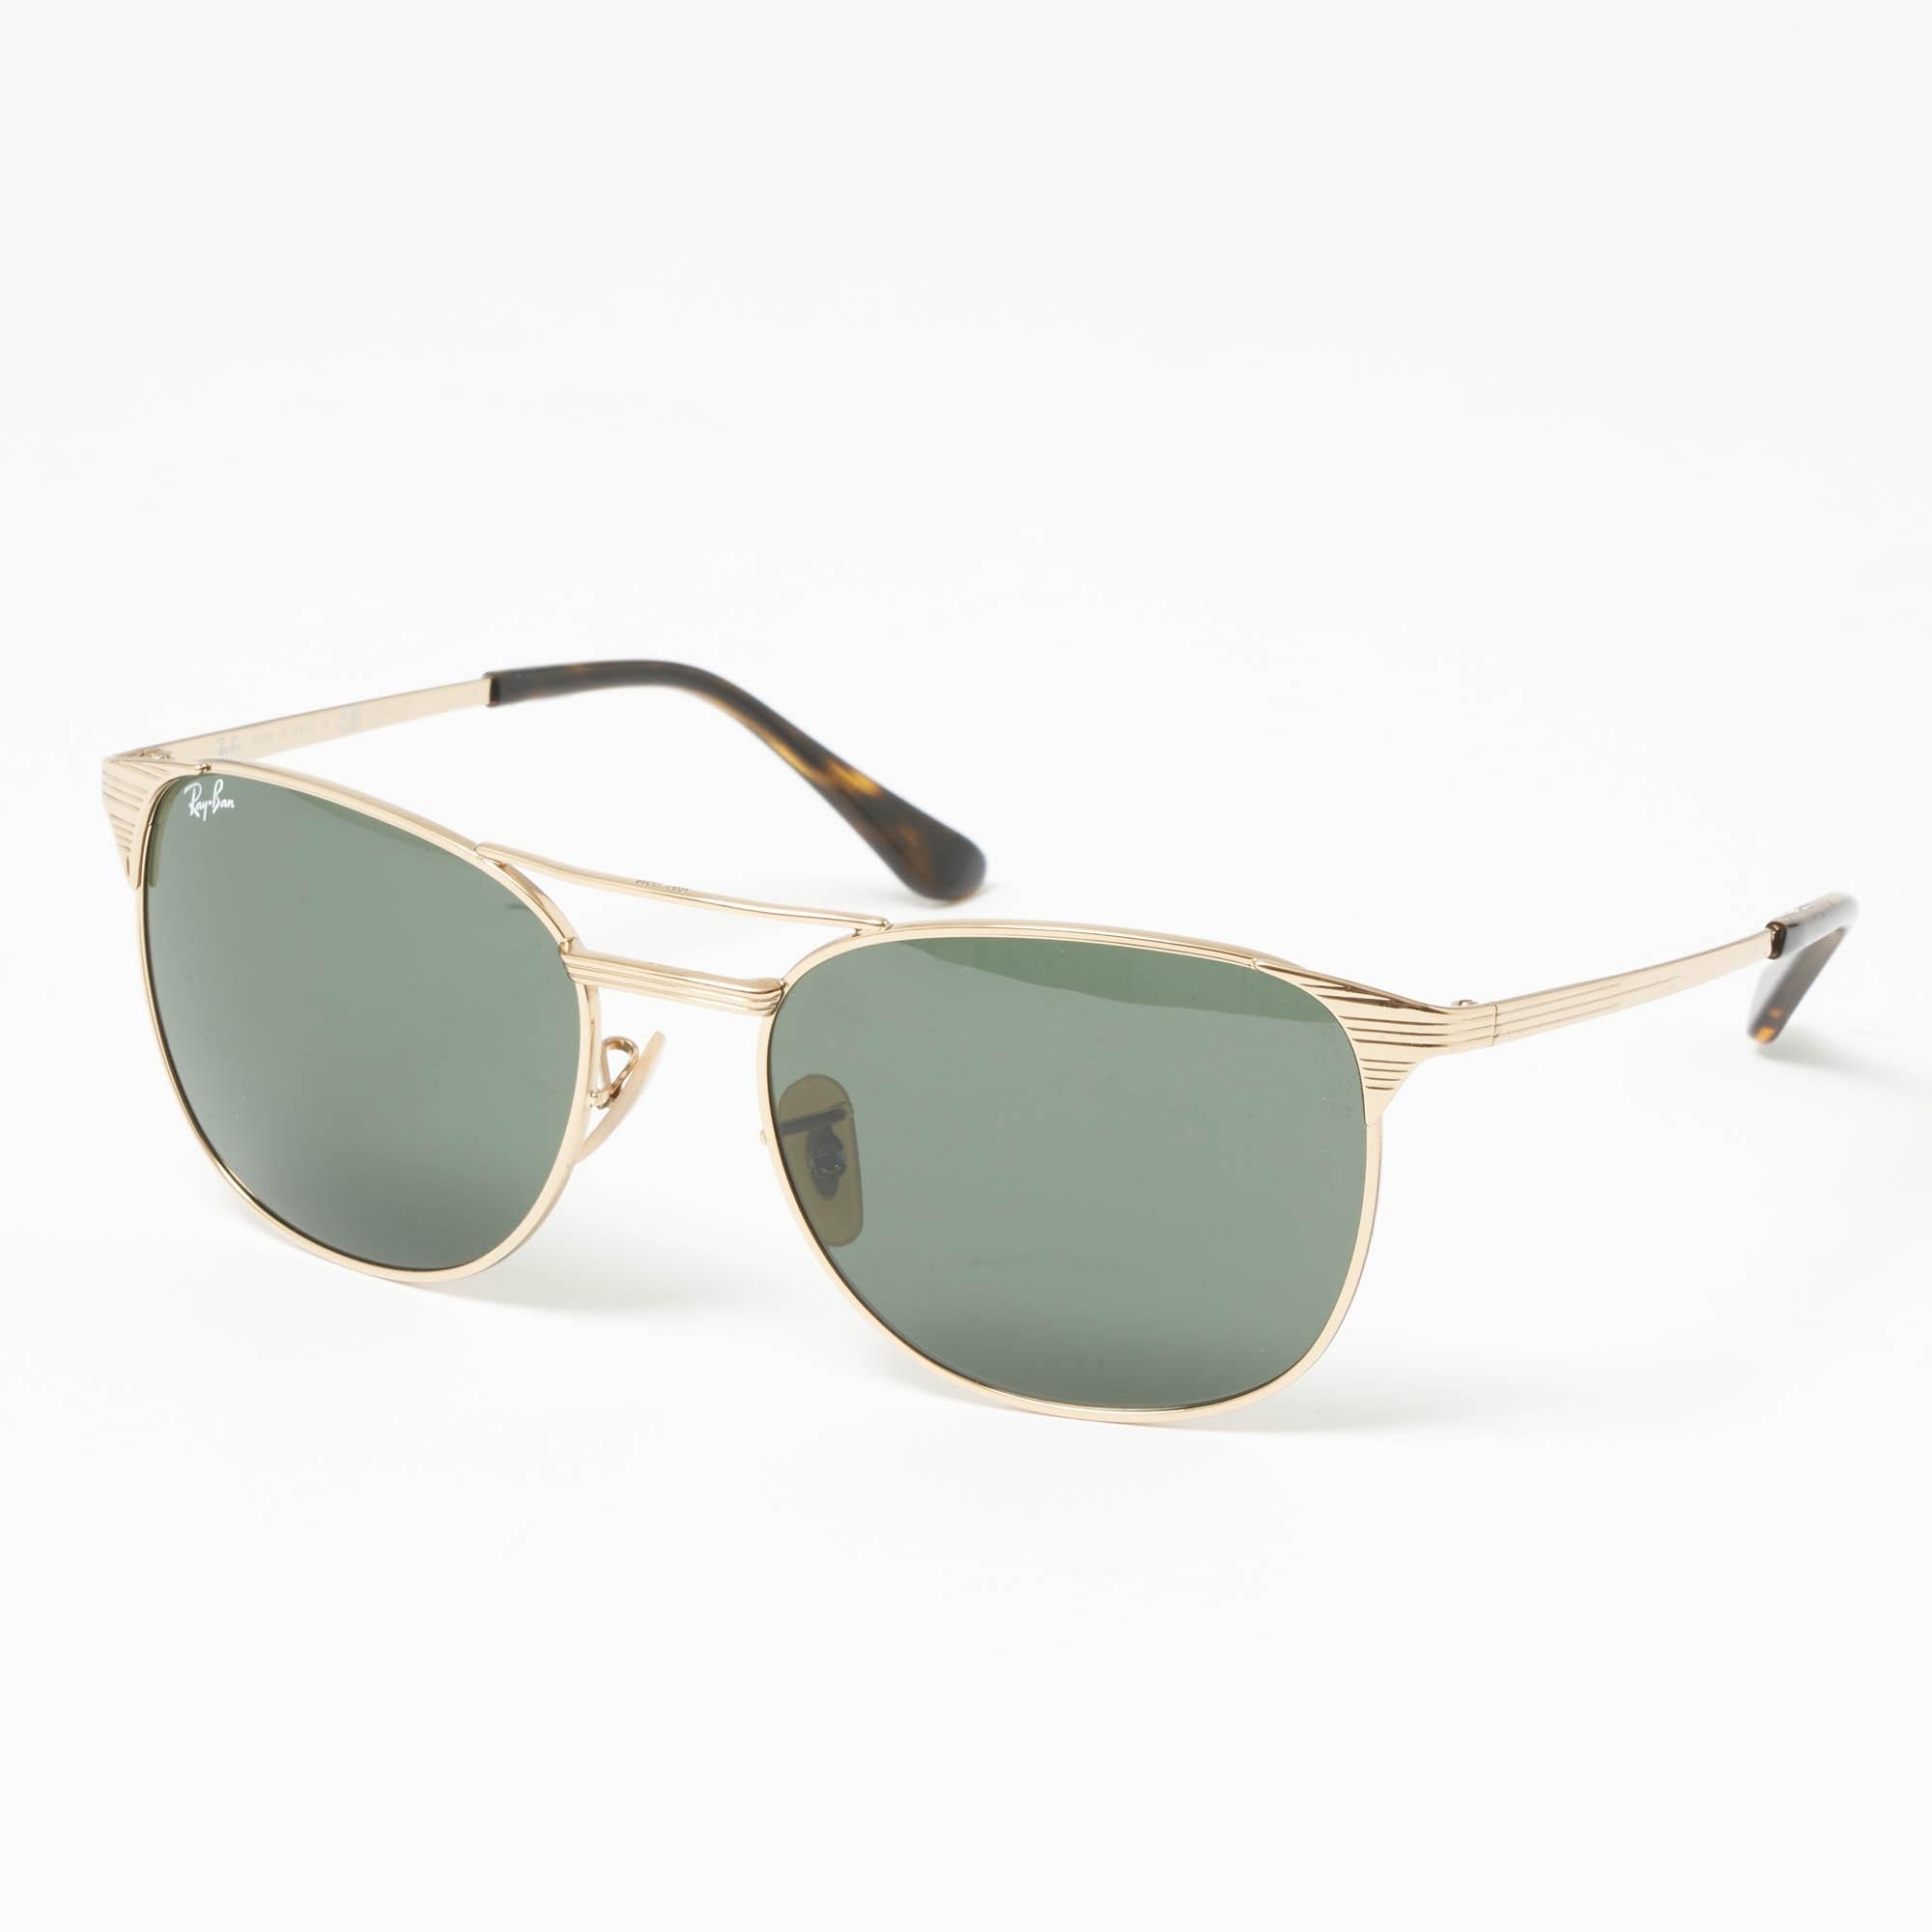 95ce9f12a4 Gold Signet Sunglasses - Green Classic G-15 Lenses